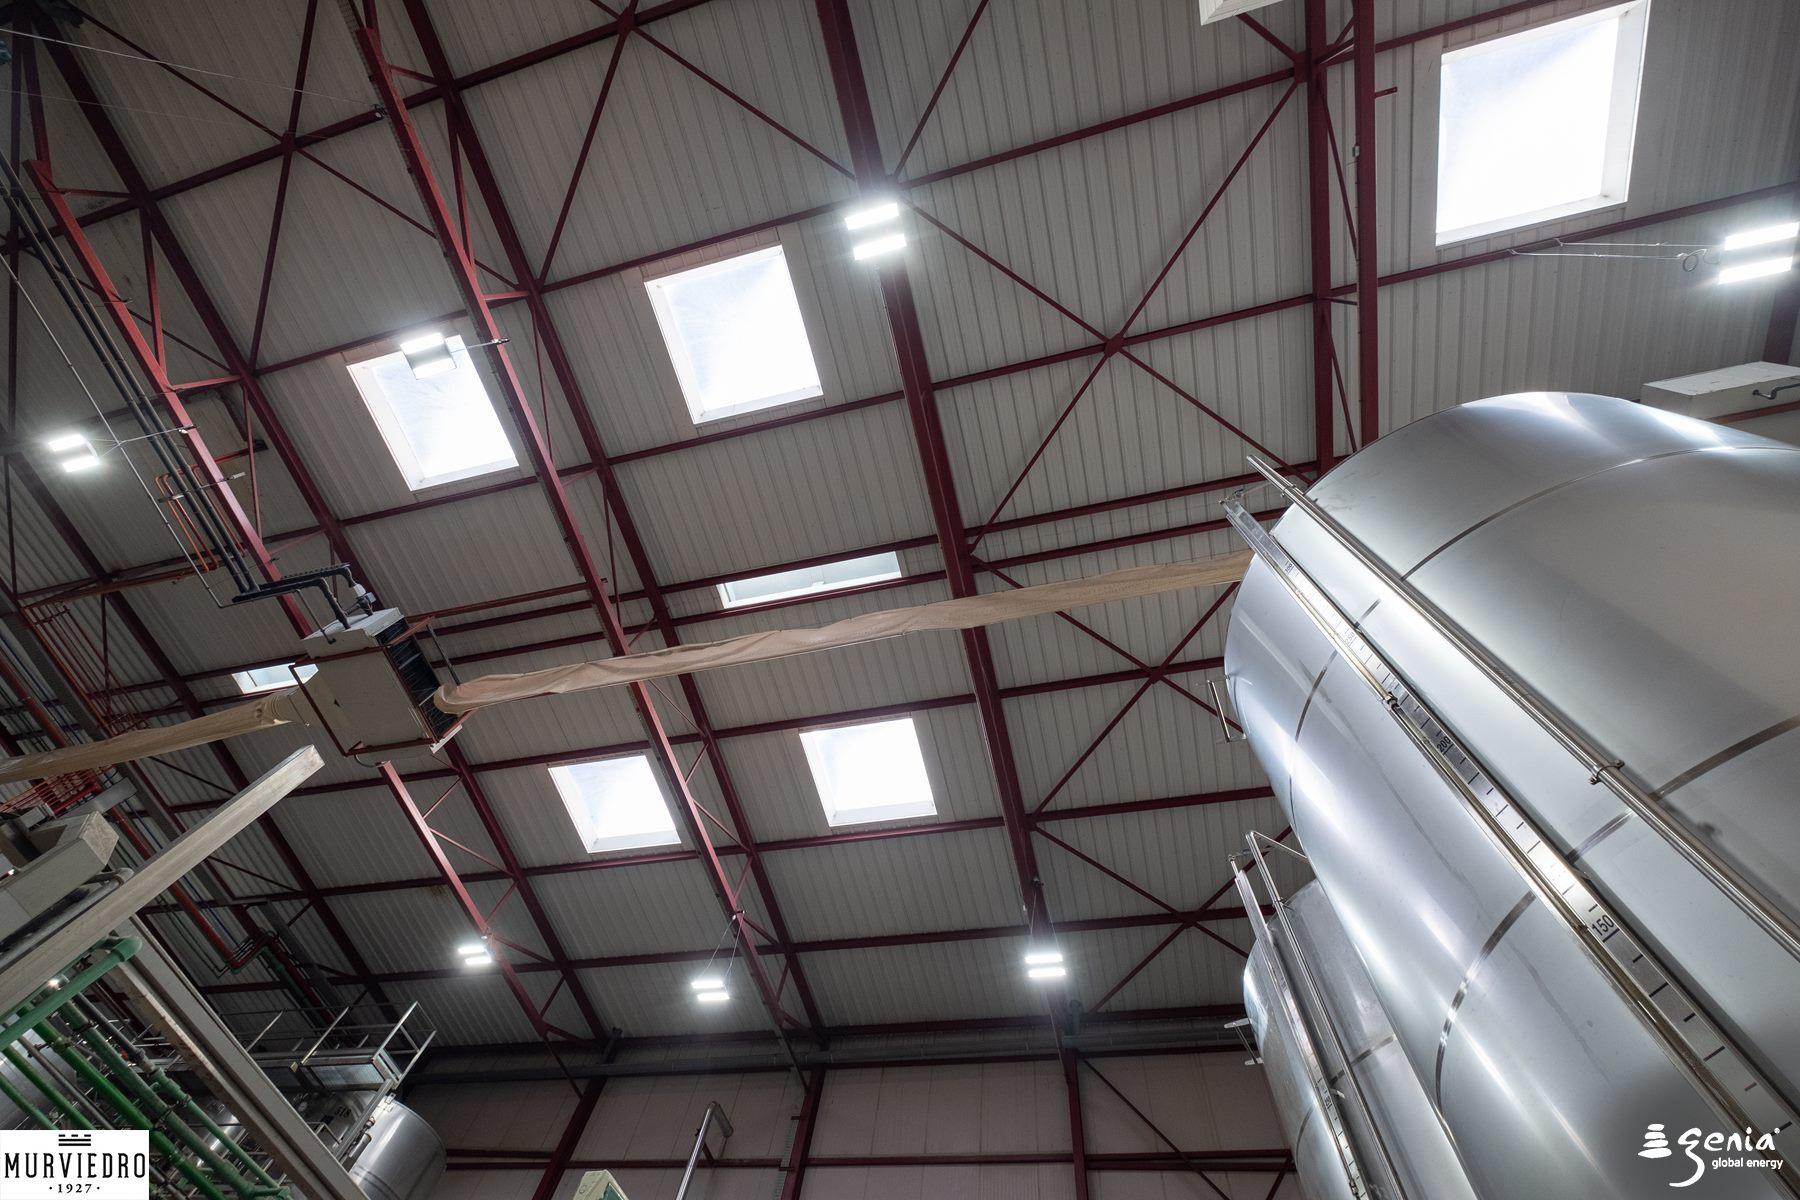 iluminacion-inteligente-industrial-bodegas-murviedro-bodega-e-isobaricas-3